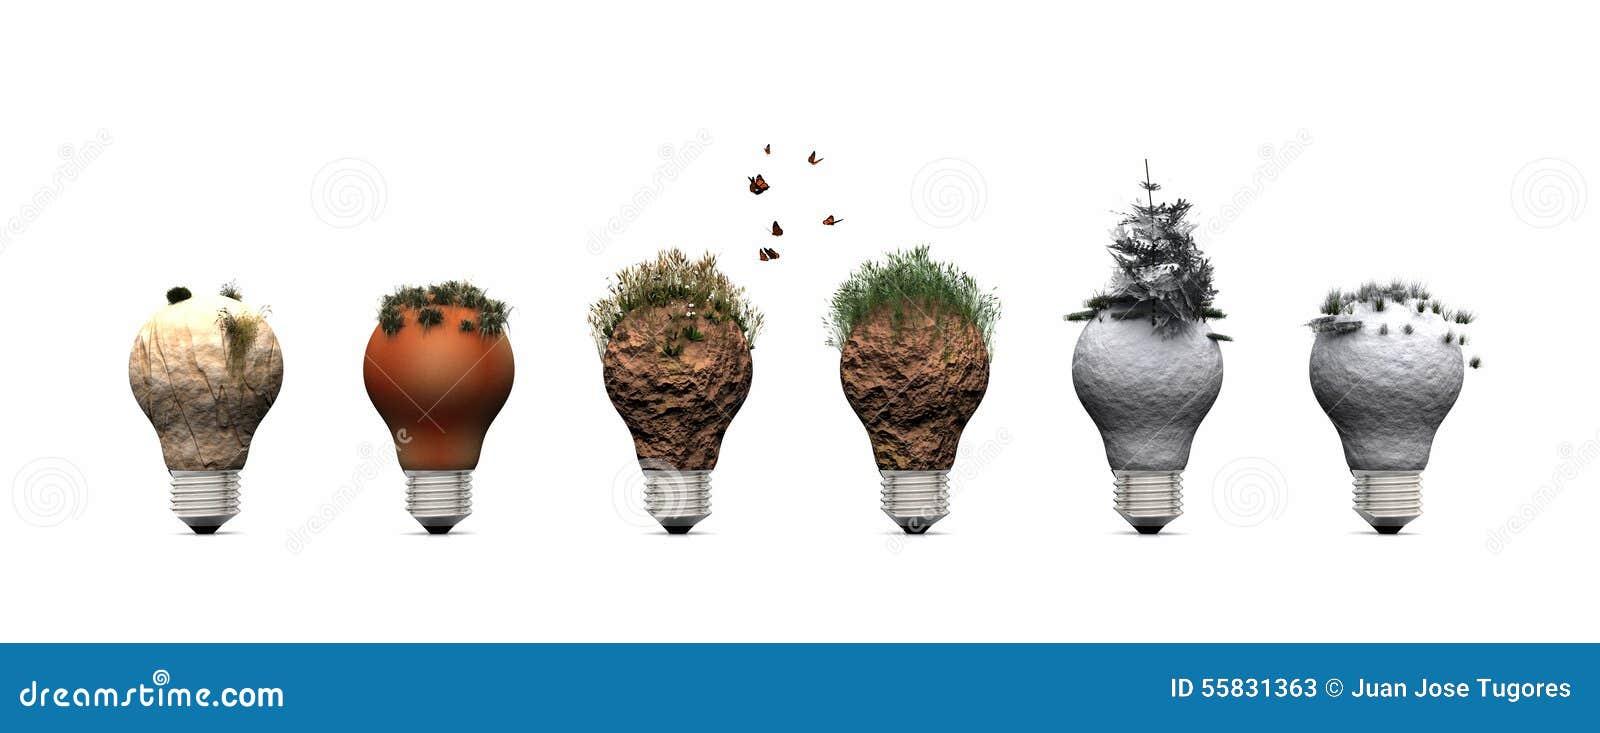 Kula och ekosystem